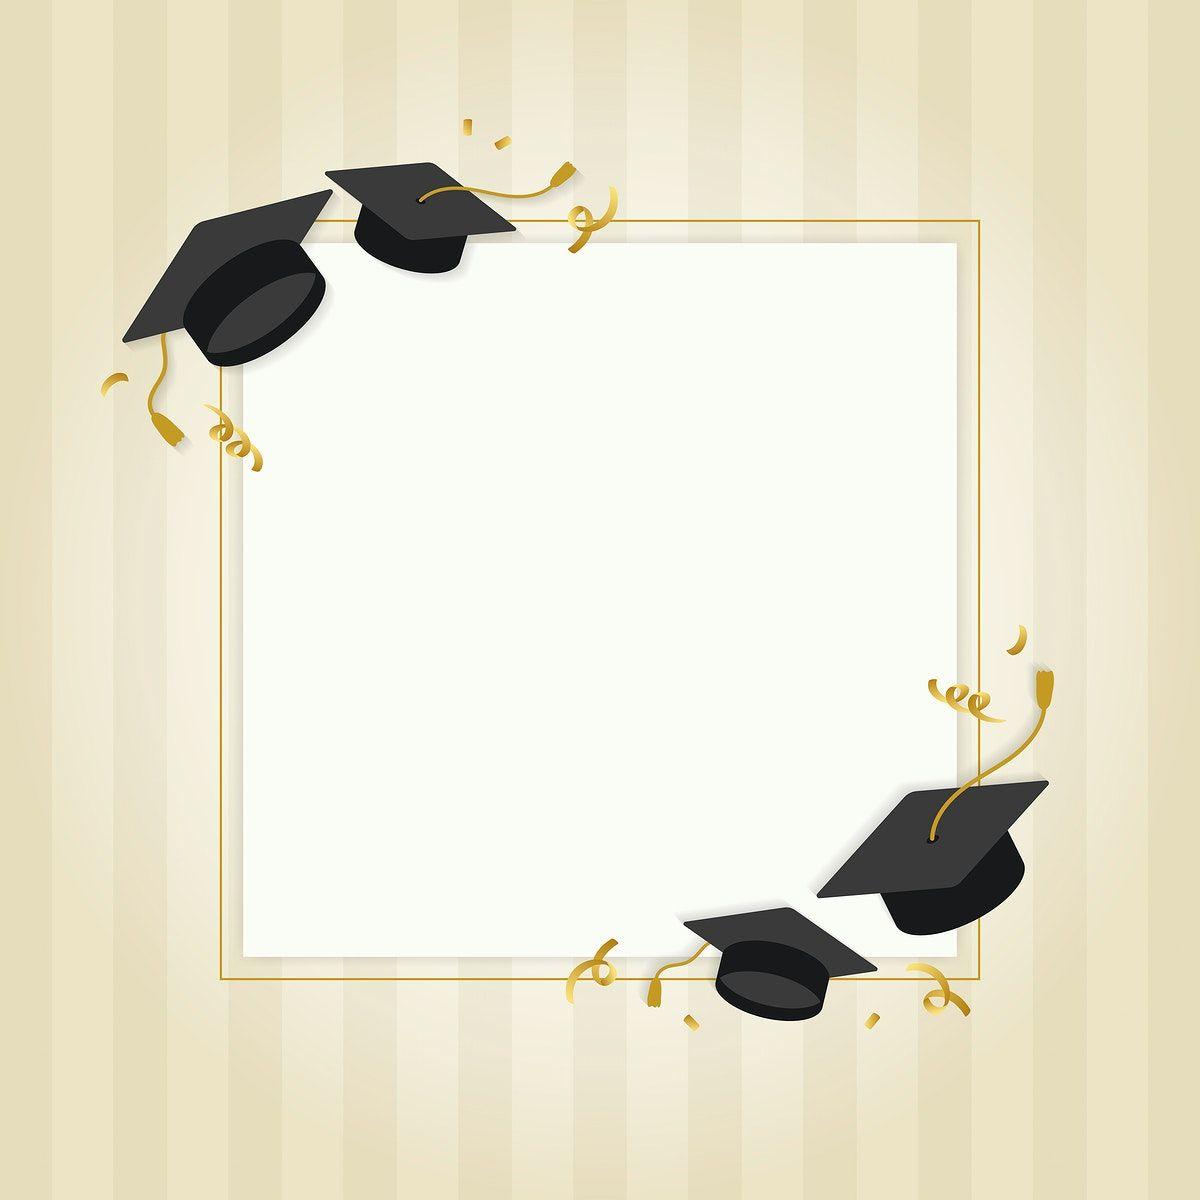 Download Premium Vector Of Graduation Background With Mortar Boards Vector Graduation Frame Graduation Images Vector Free